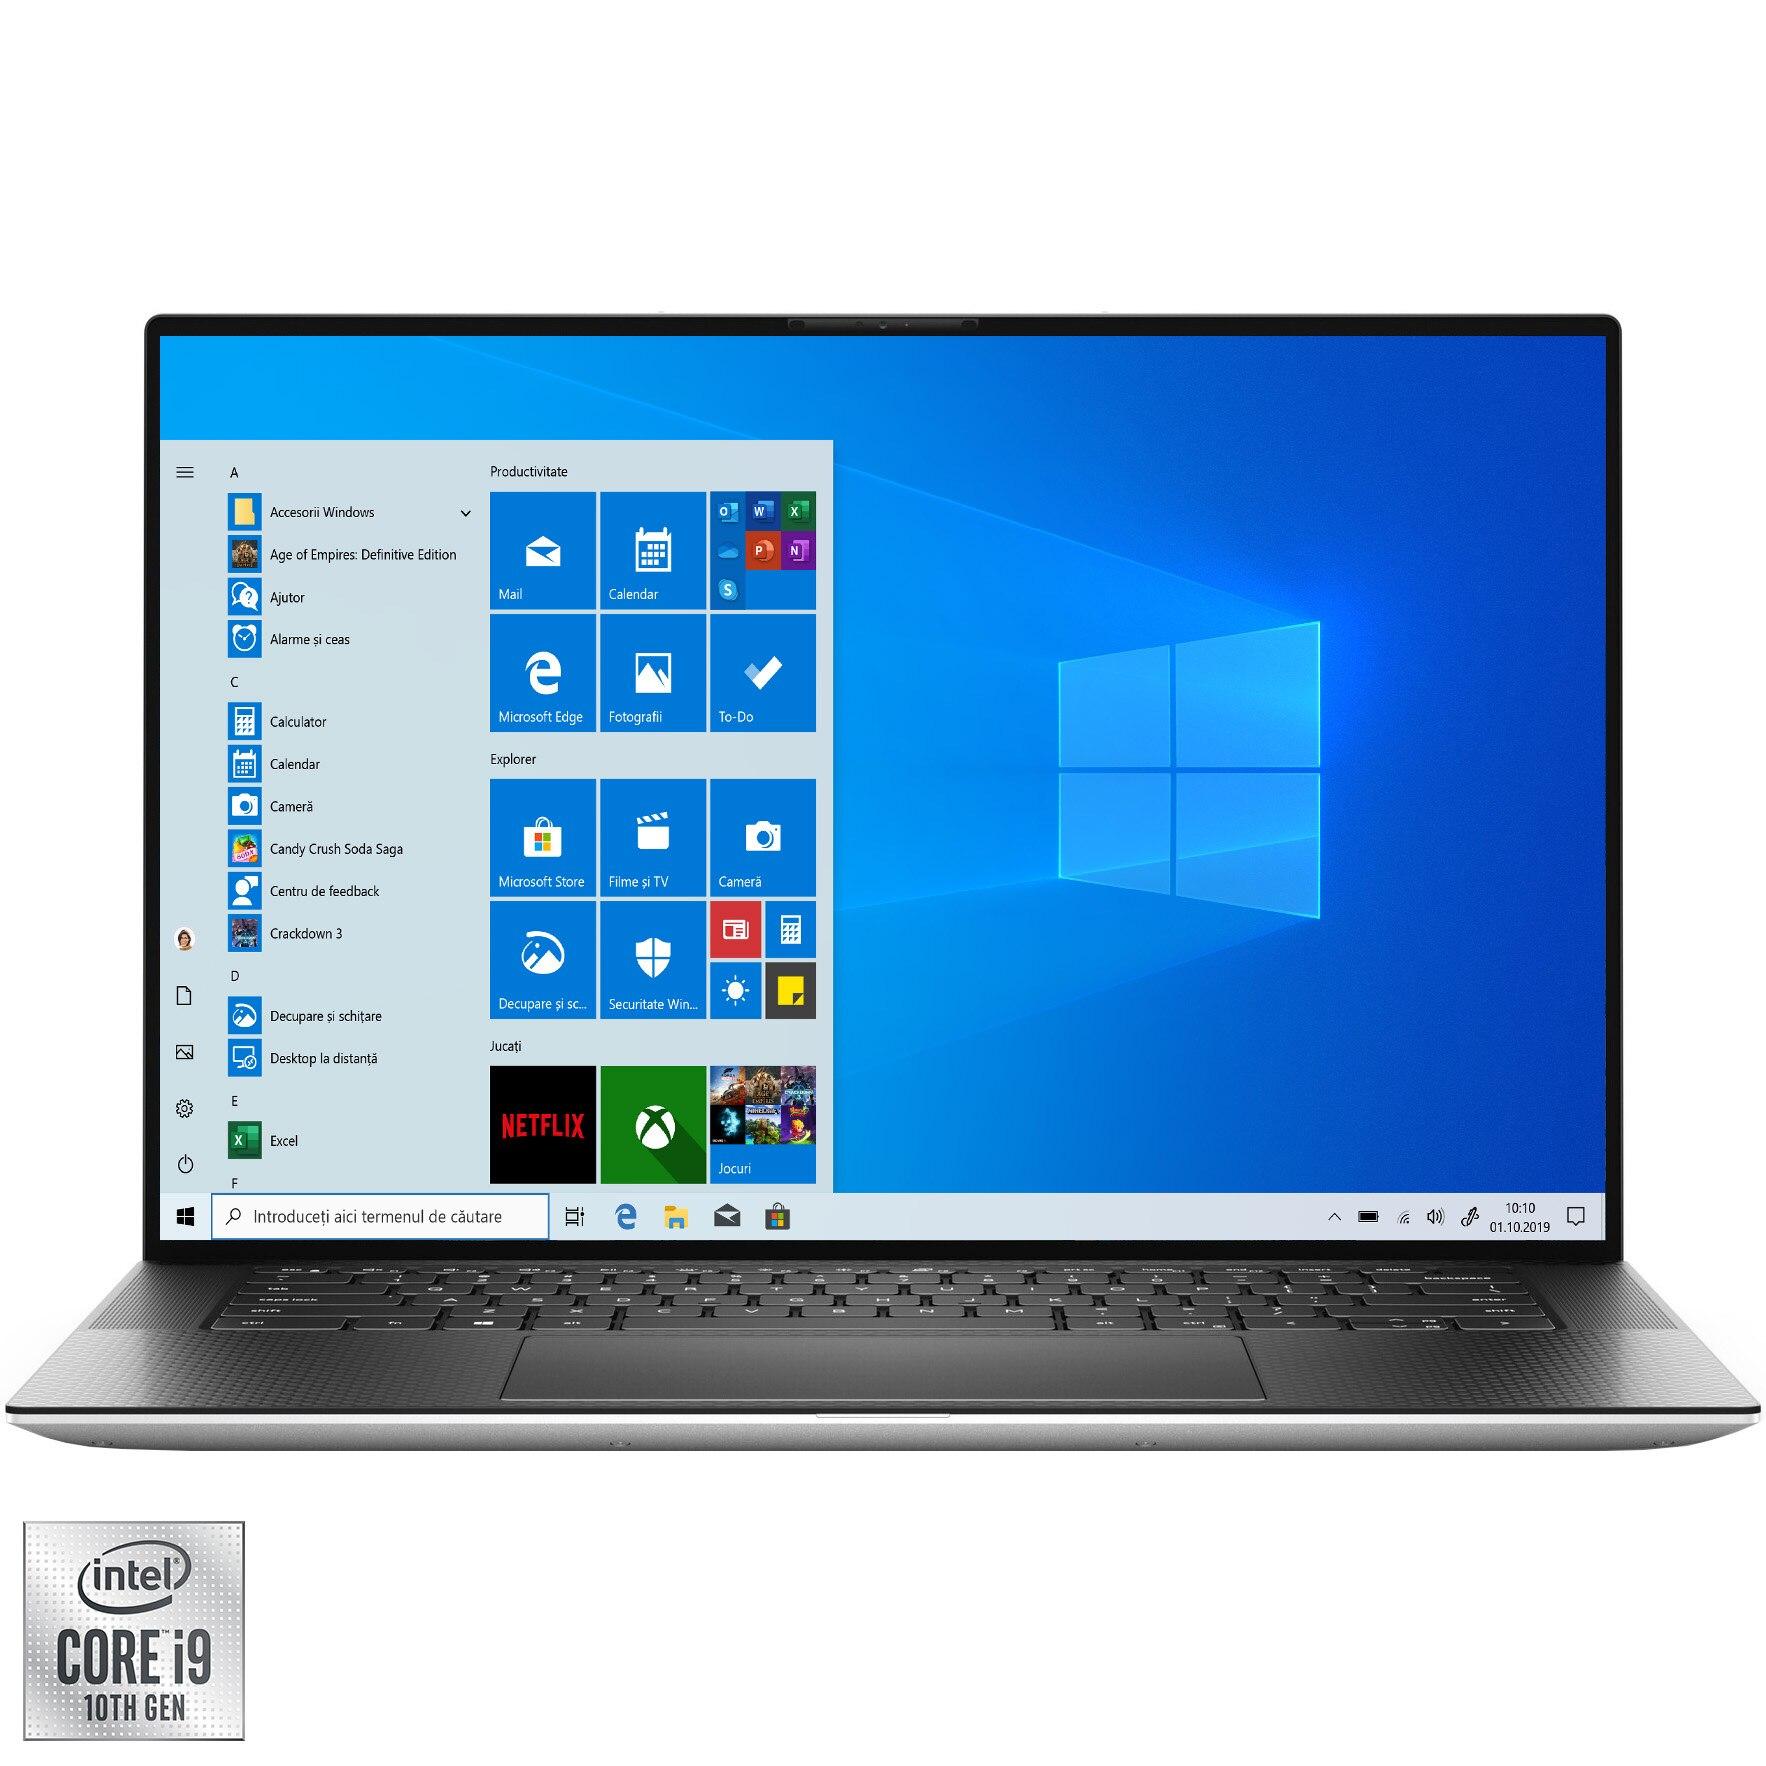 "Fotografie Laptop ultraportabil Dell XPS 15 9500 cu procesor Intel Core i9-10885H pana la 5.30 GHz, 15.6"", UHD +, 64GB, 2TB SSD, NVIDIA GeForce GTX 1650 Ti 4GB, Windows 10 Pro, Platinum Silver"